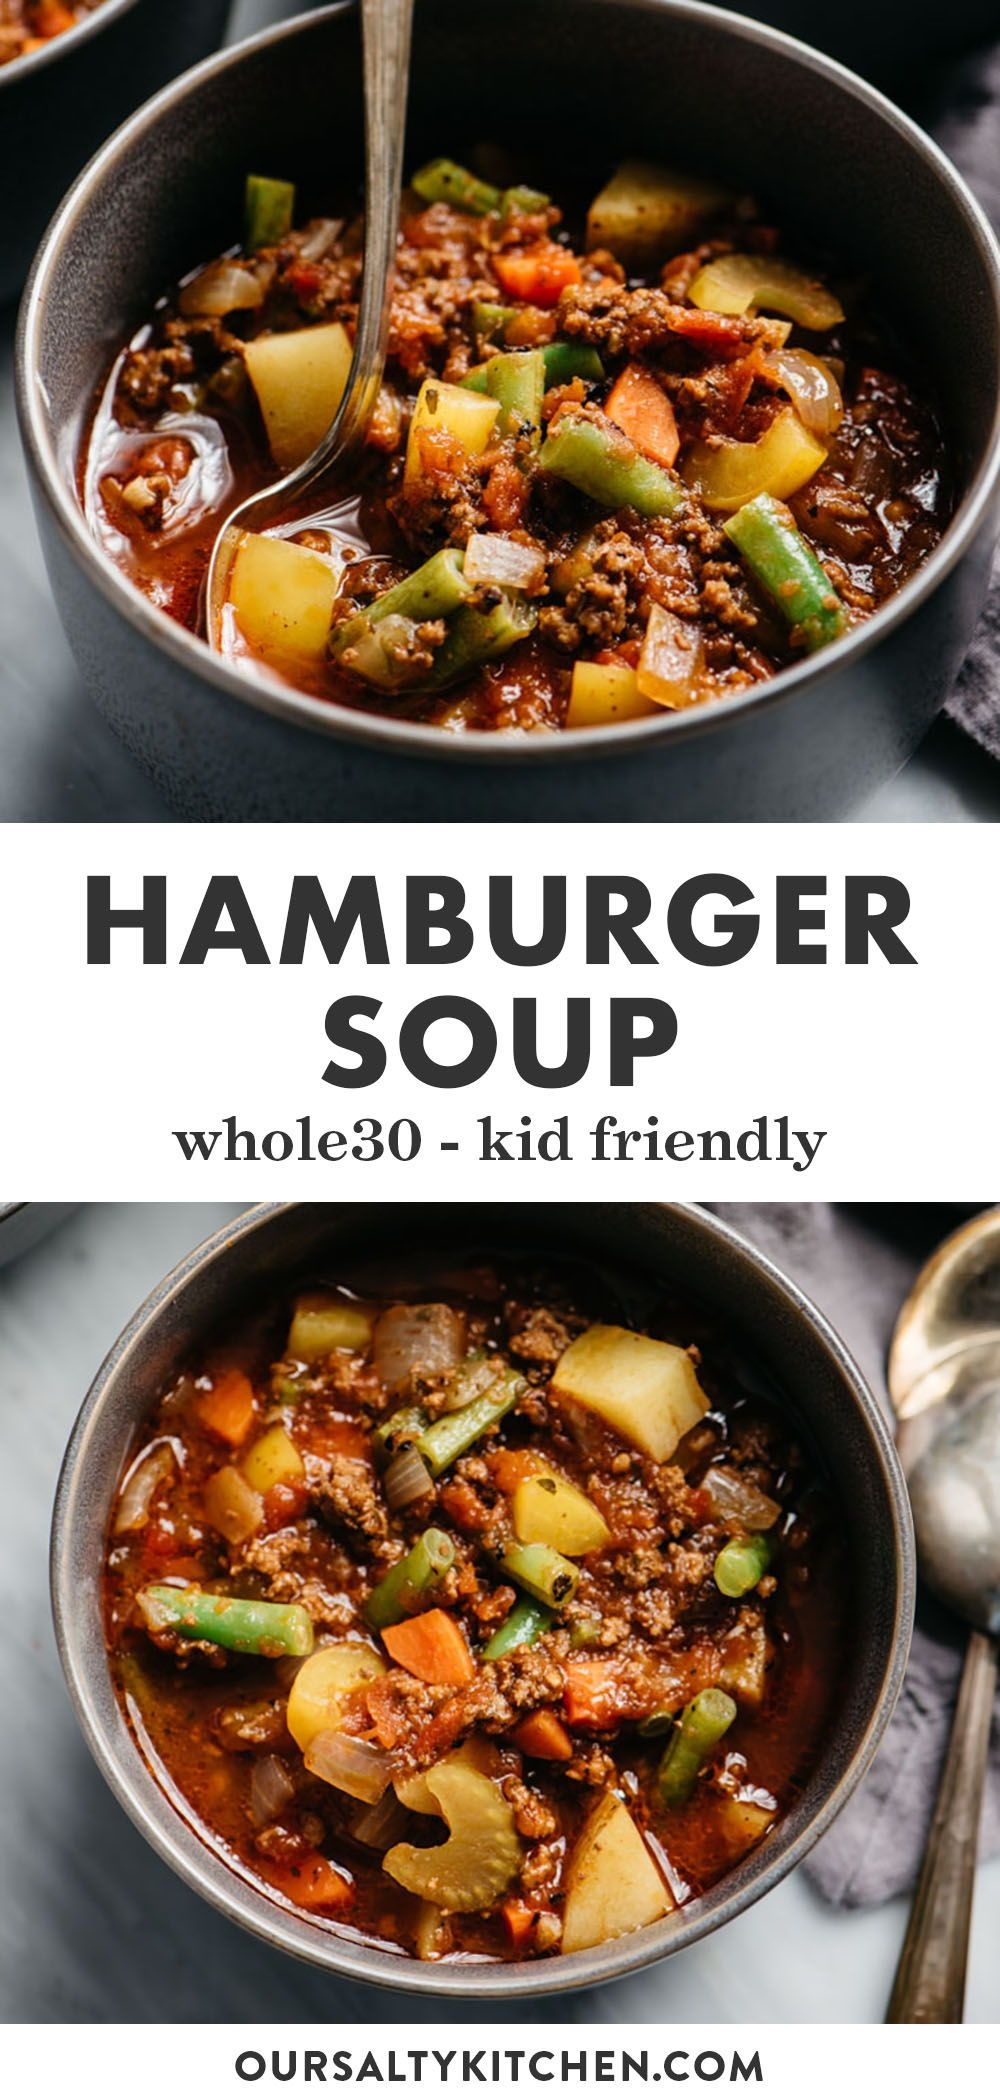 Paleo And Whole30 Hamburger Soup Recipe In 2020 Whole Food Recipes Beef Recipes Recipes